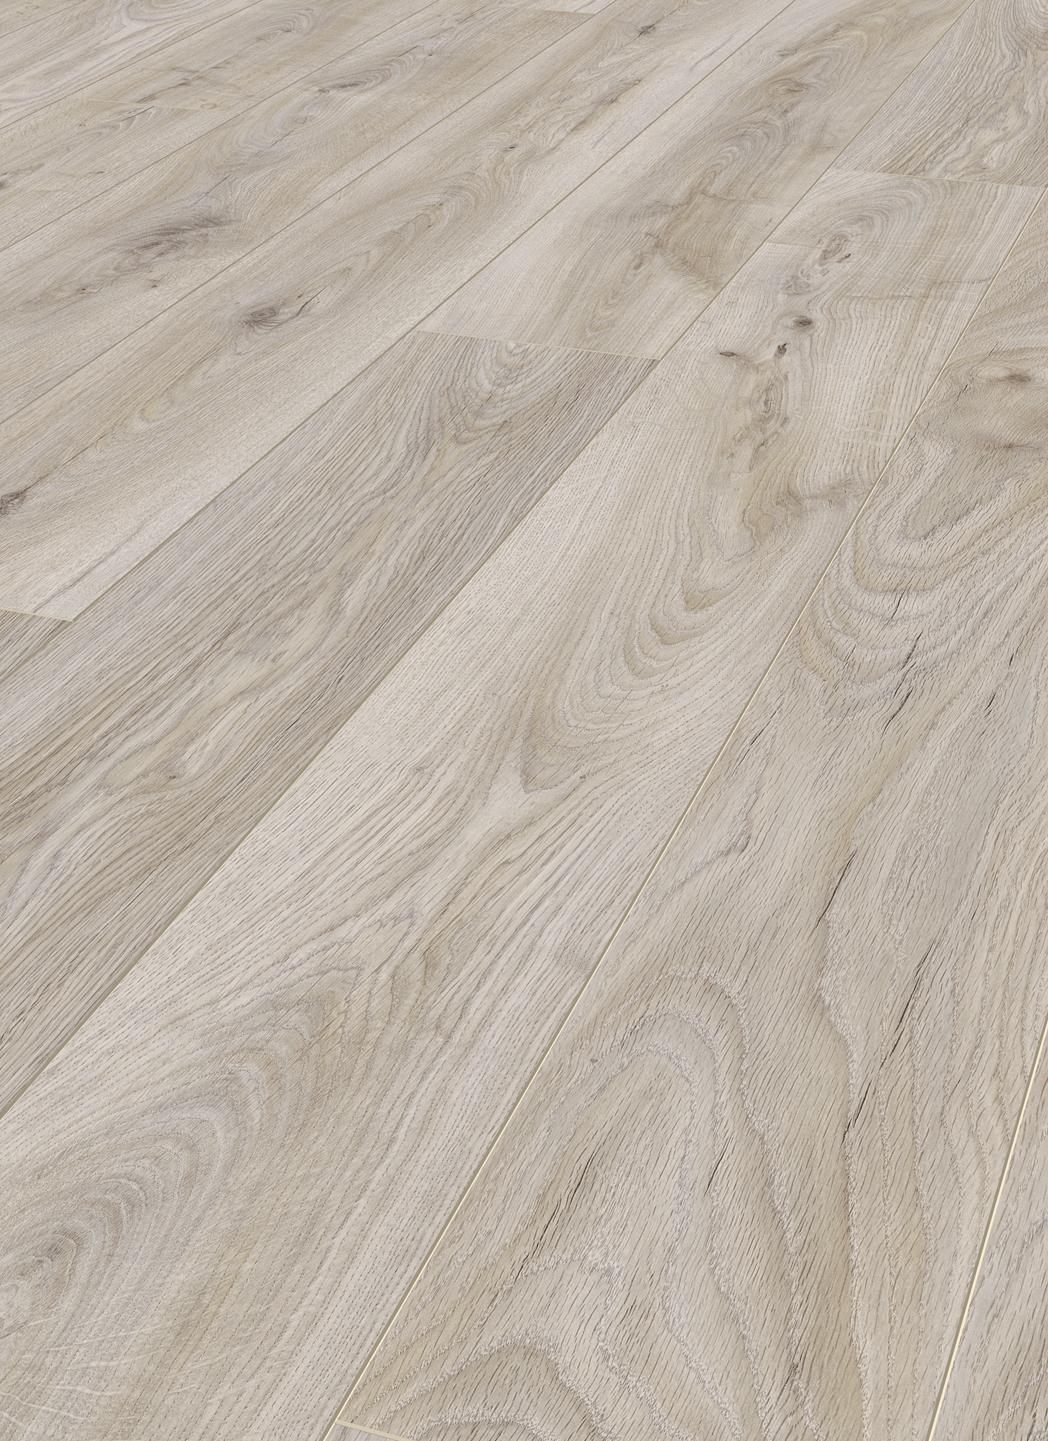 Laminate long boards oak light grey for london for Laminate flooring london